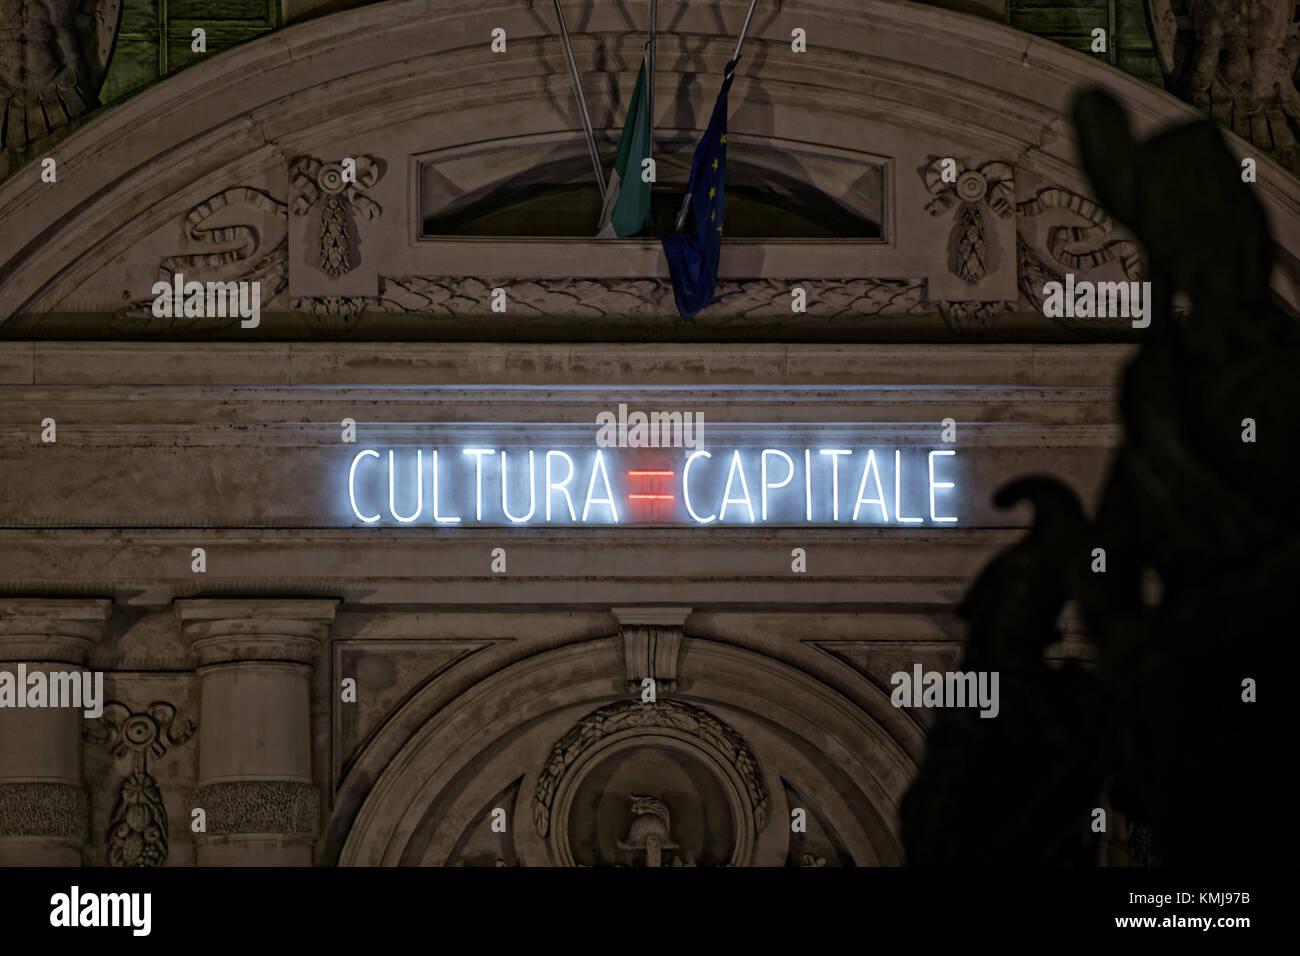 Torino, Italy. Luci d'artista (Artist Lights). Artwork: Cultura=Capitale, Alfredo Jaar - Stock Image